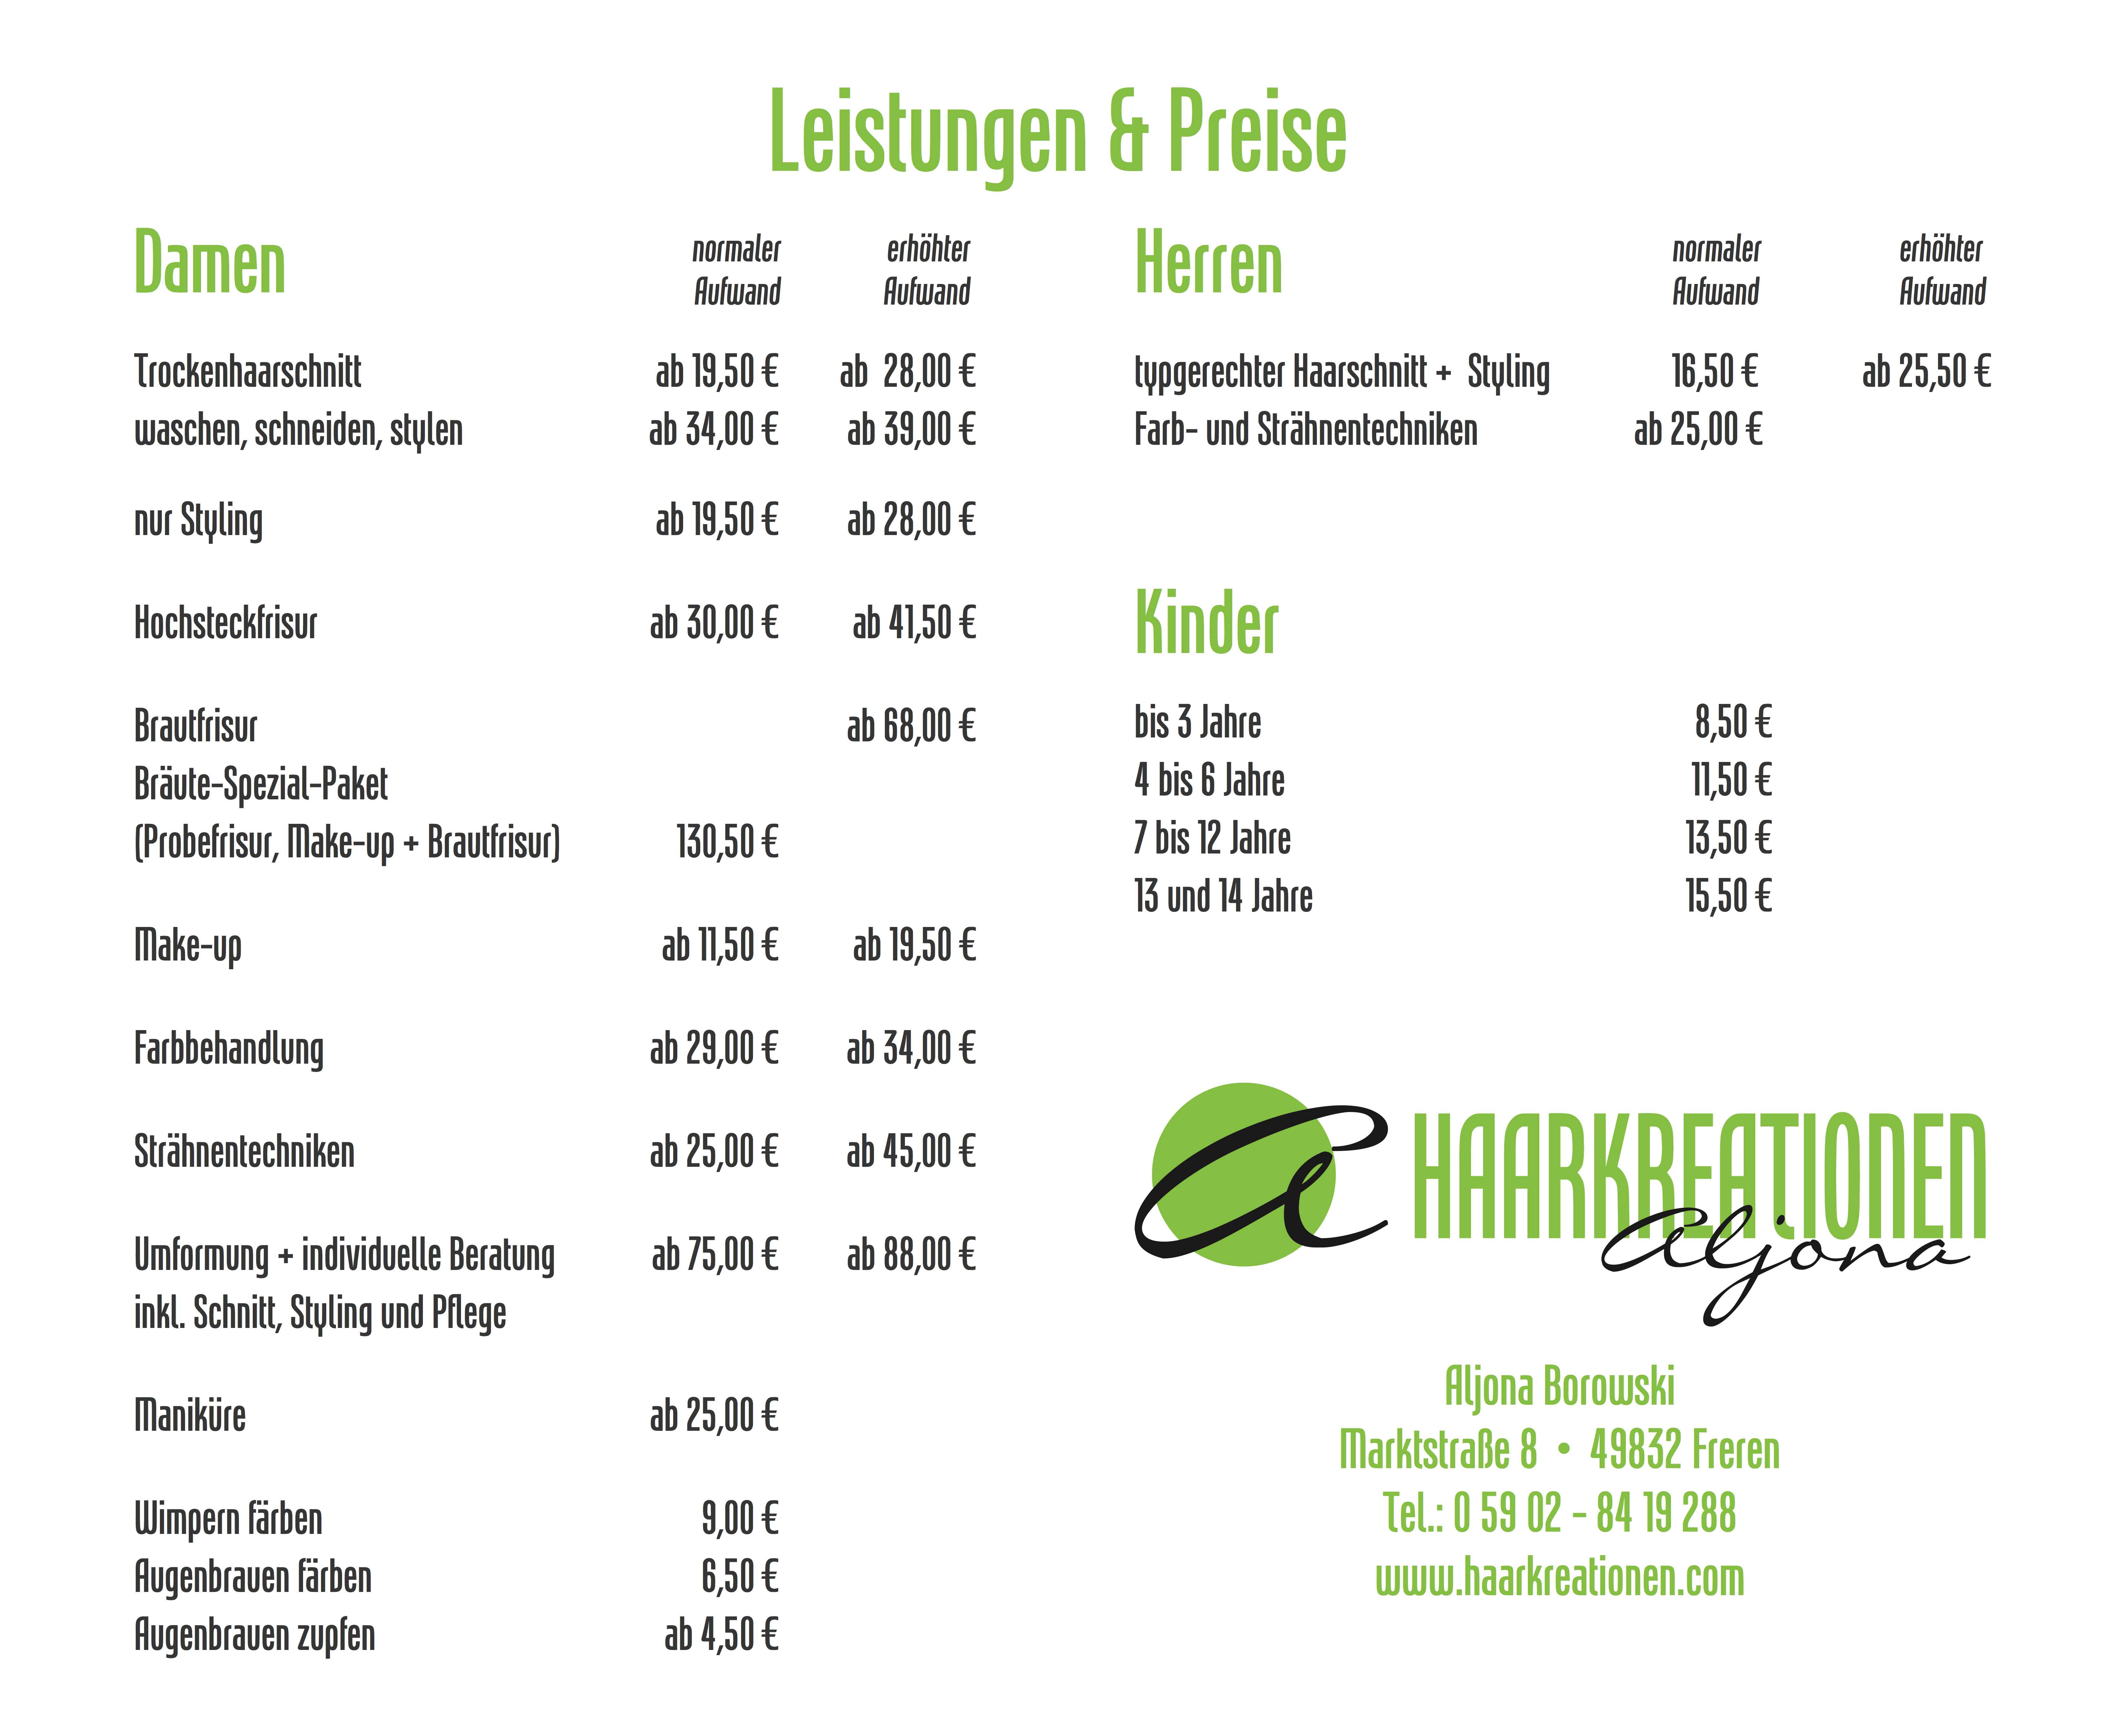 Haarkreationen_Preisschild_55x45_2017_v1